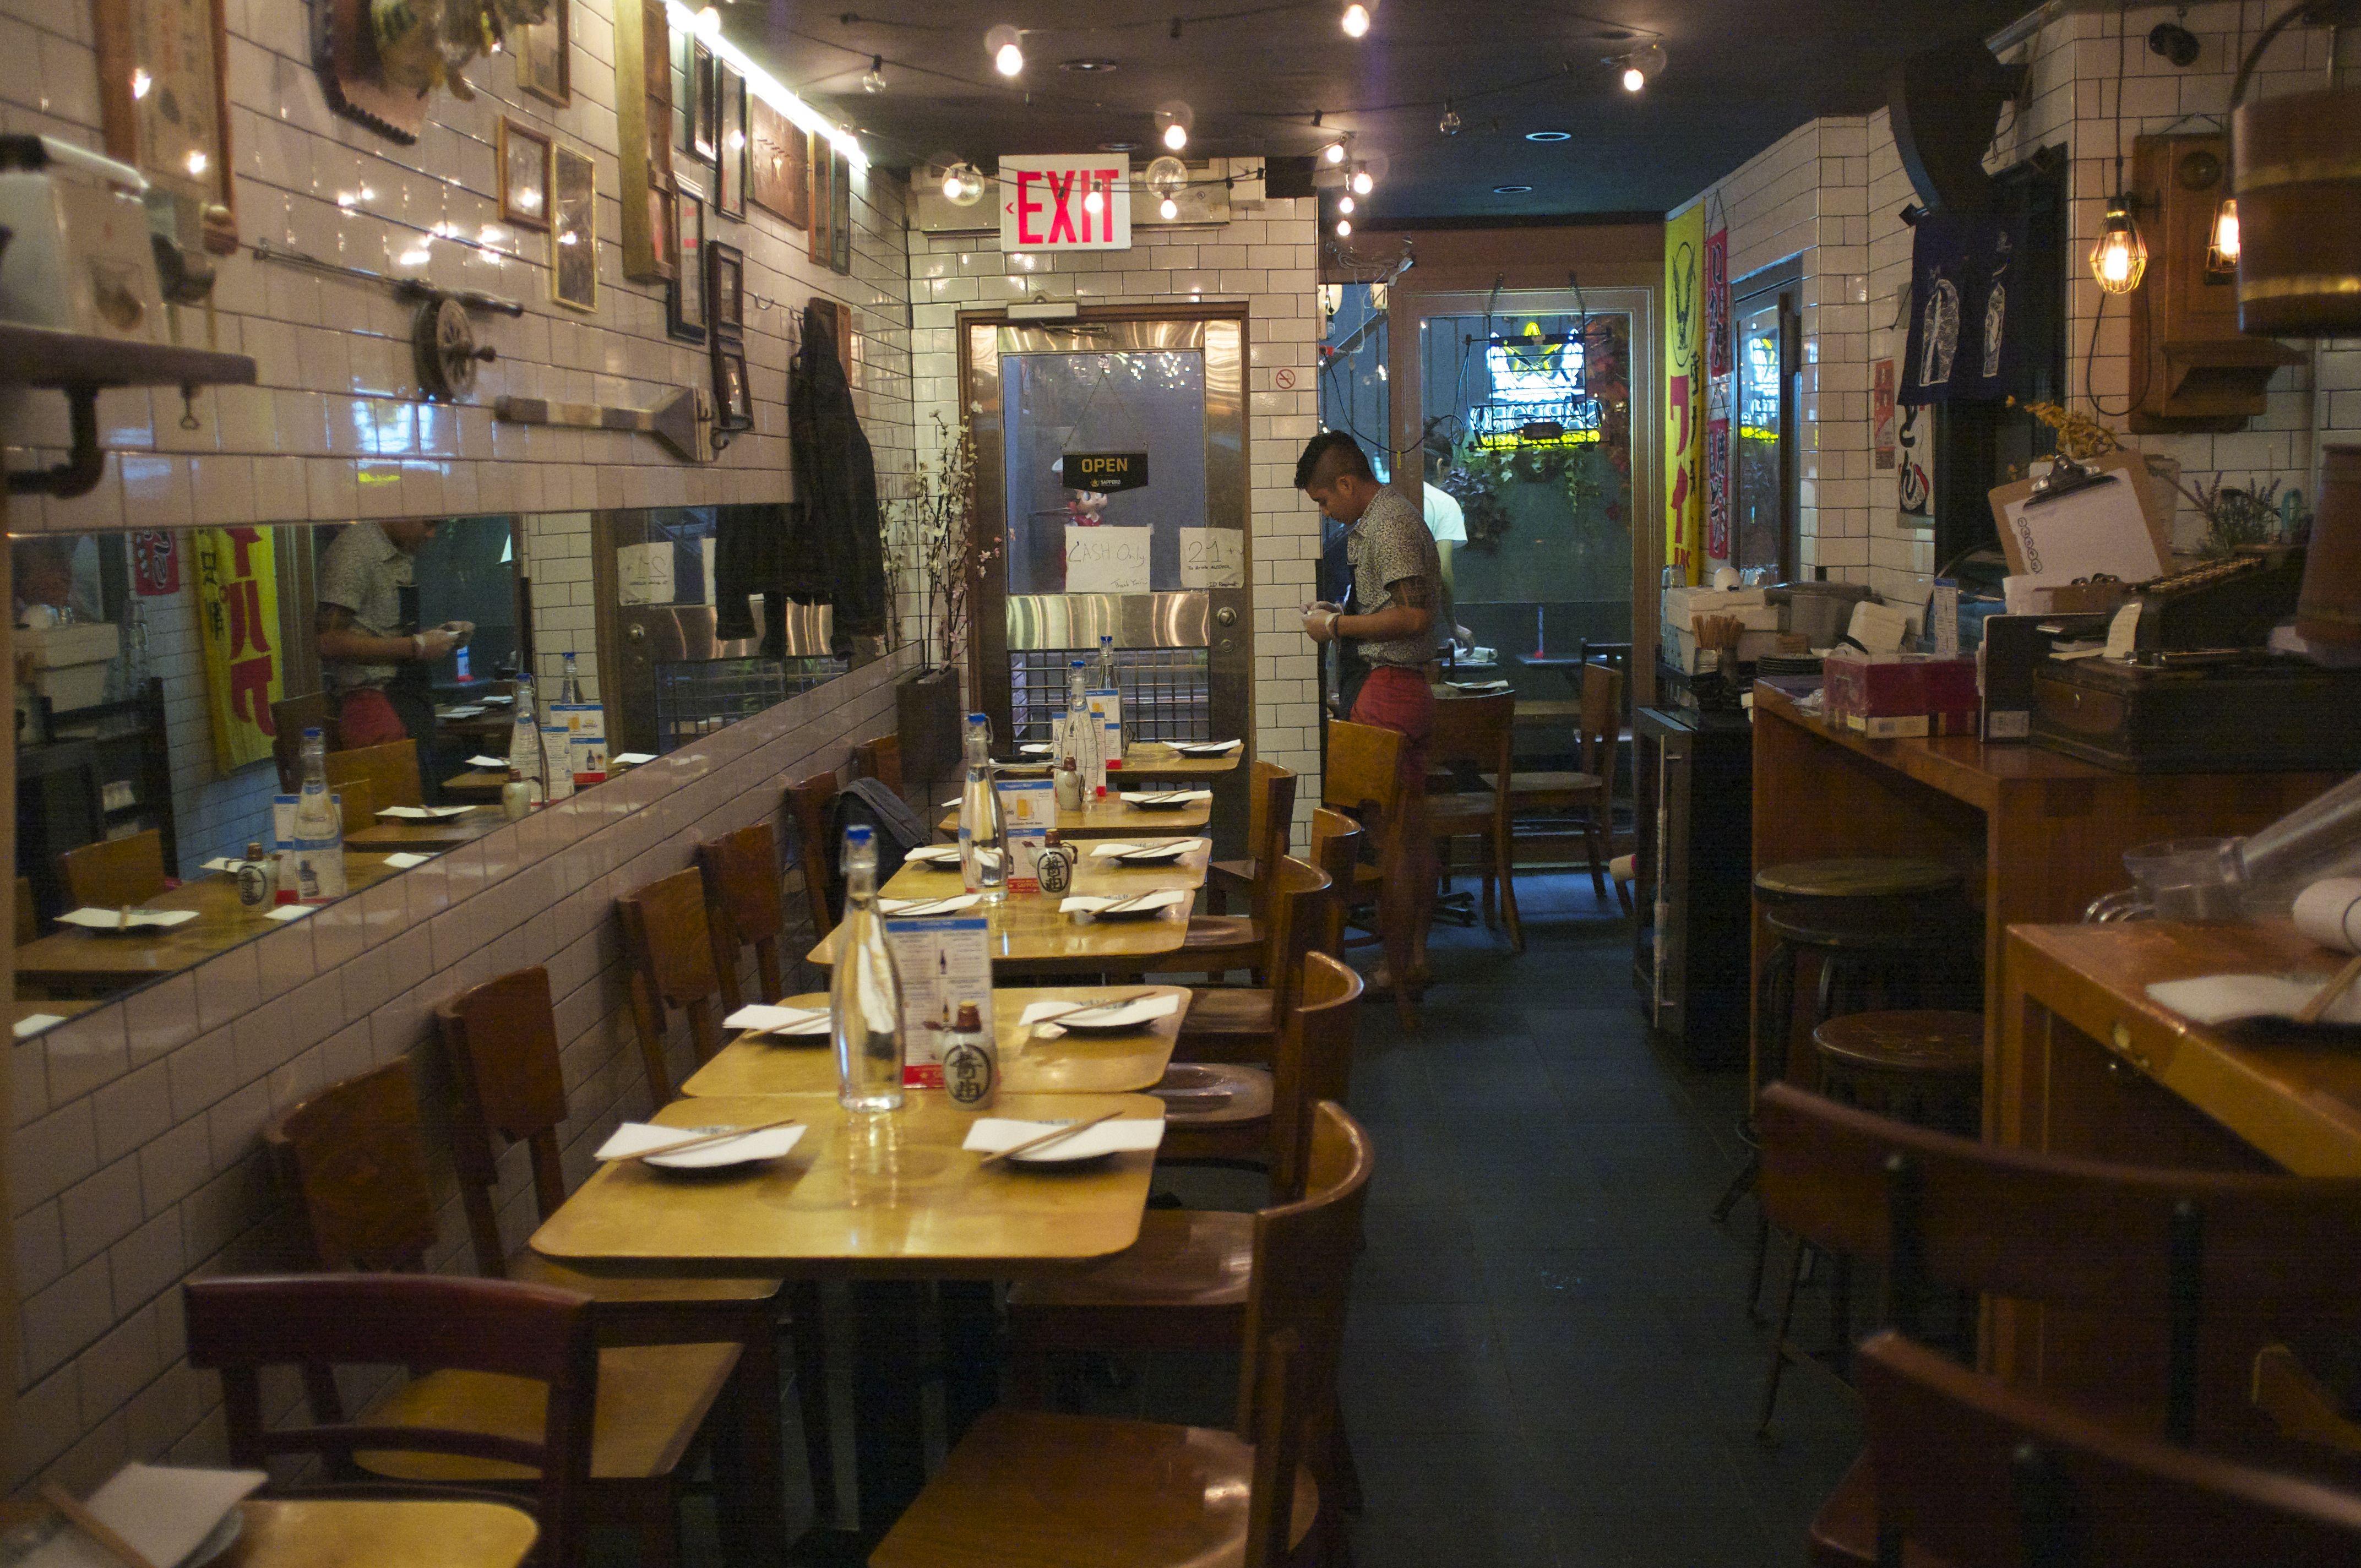 Sake bar offers 12 sapporo pitchers below michelin